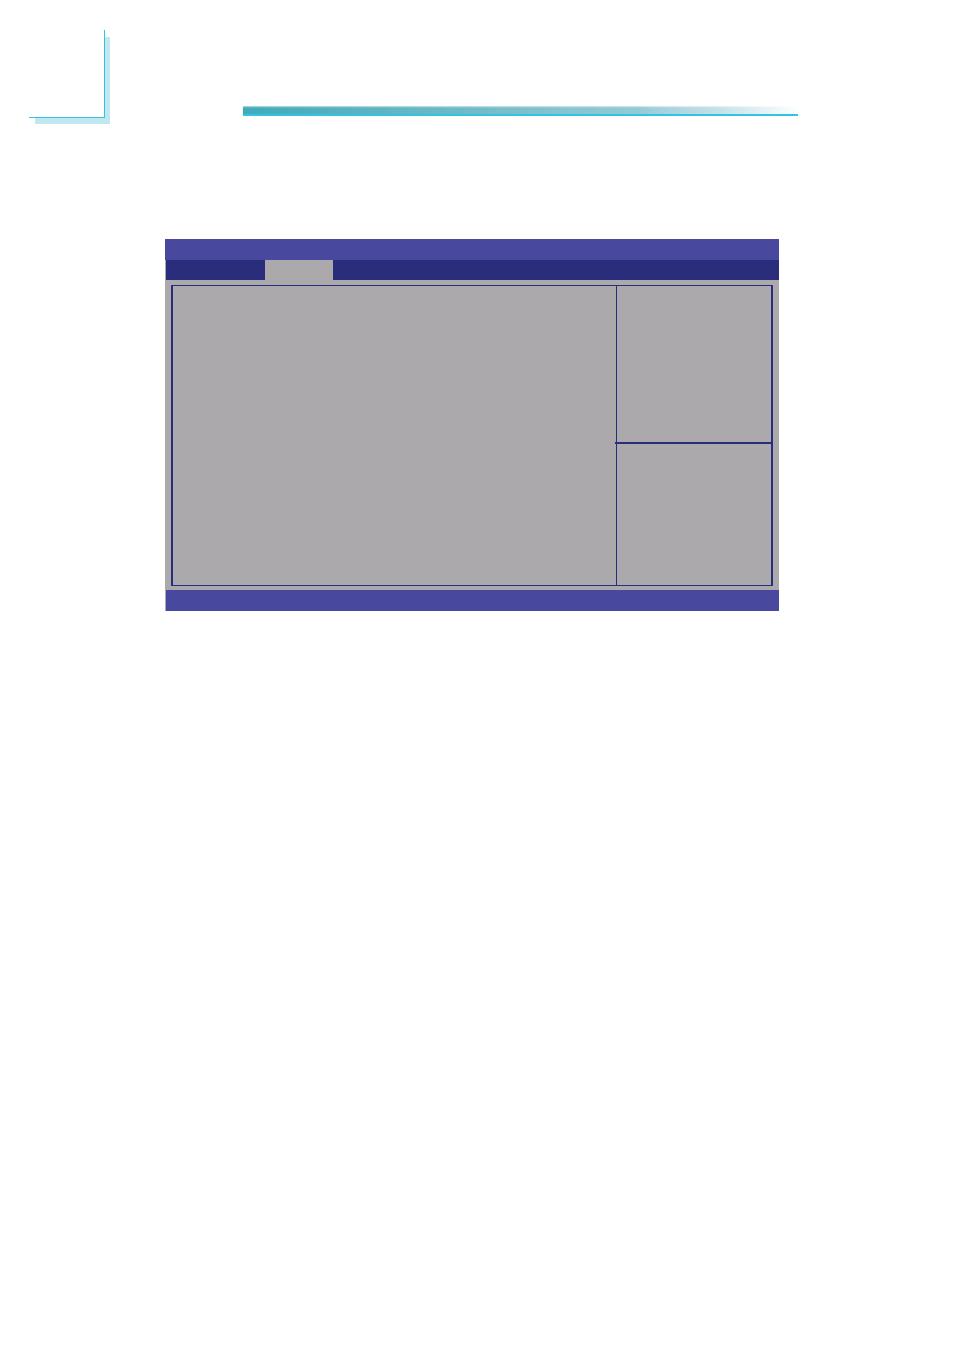 Bios setup | DFI MB630-CRM User Manual | Page 76 / 171